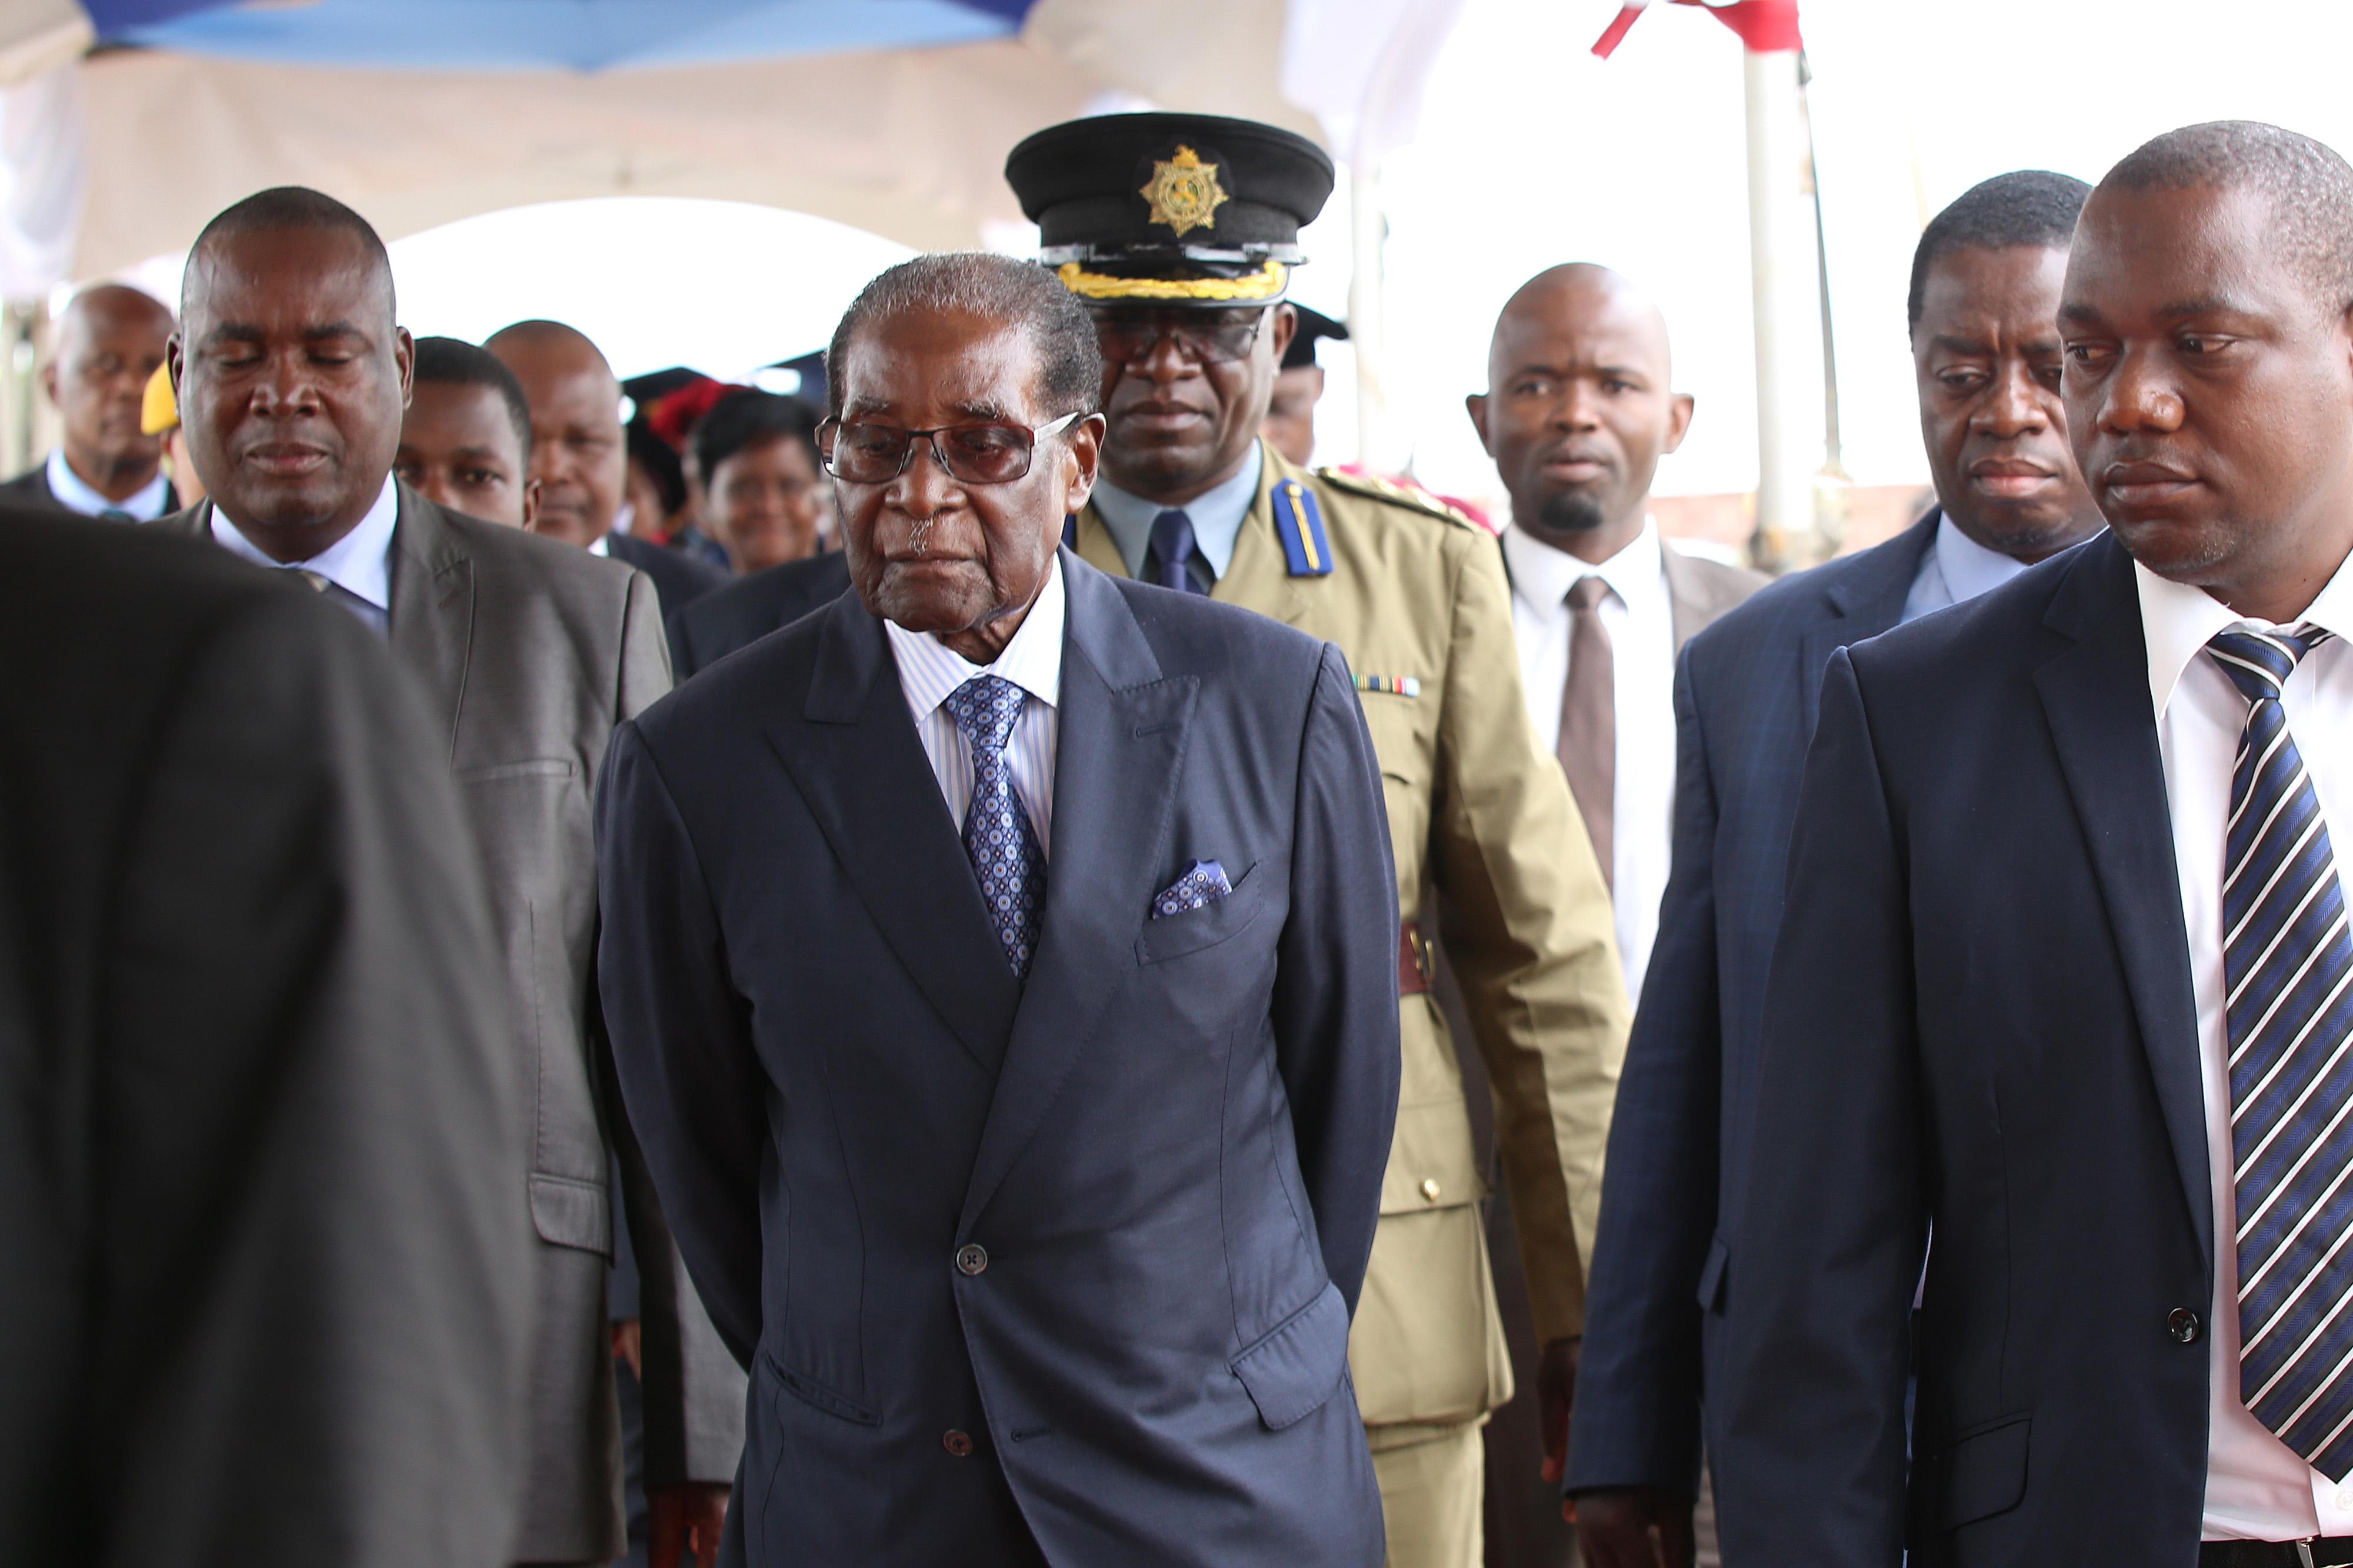 Zimbabwe's Mugabe Said to Risk Impeachment If He Doesn't Quit